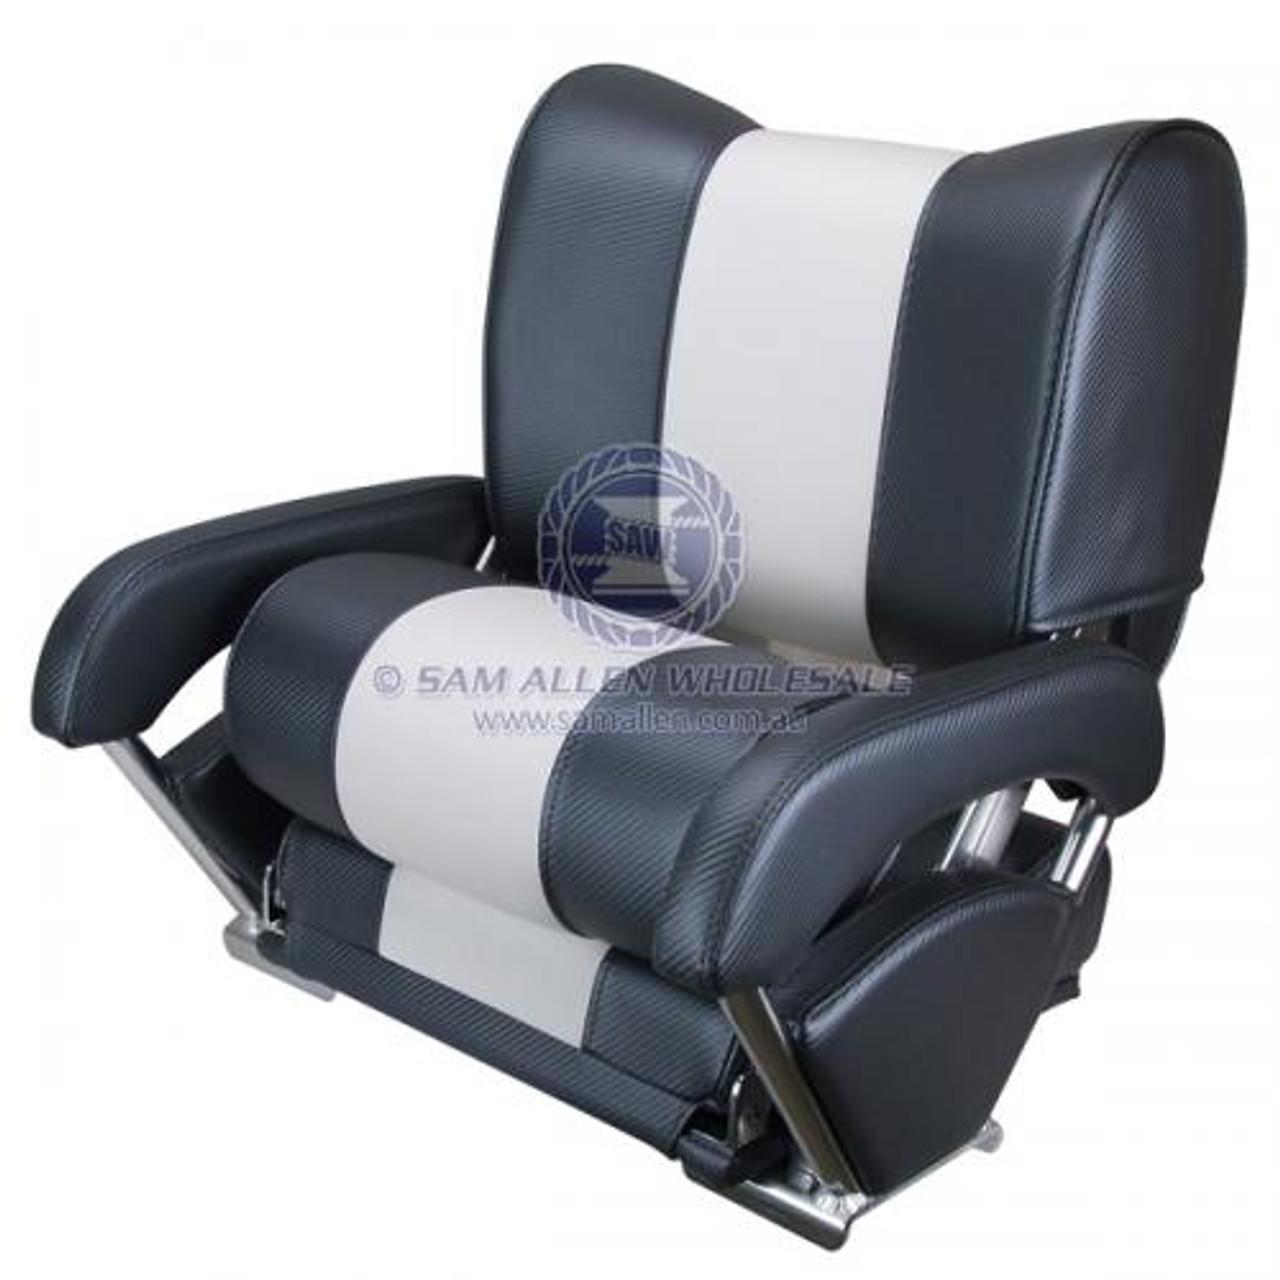 Seat - Thigh Rest Down